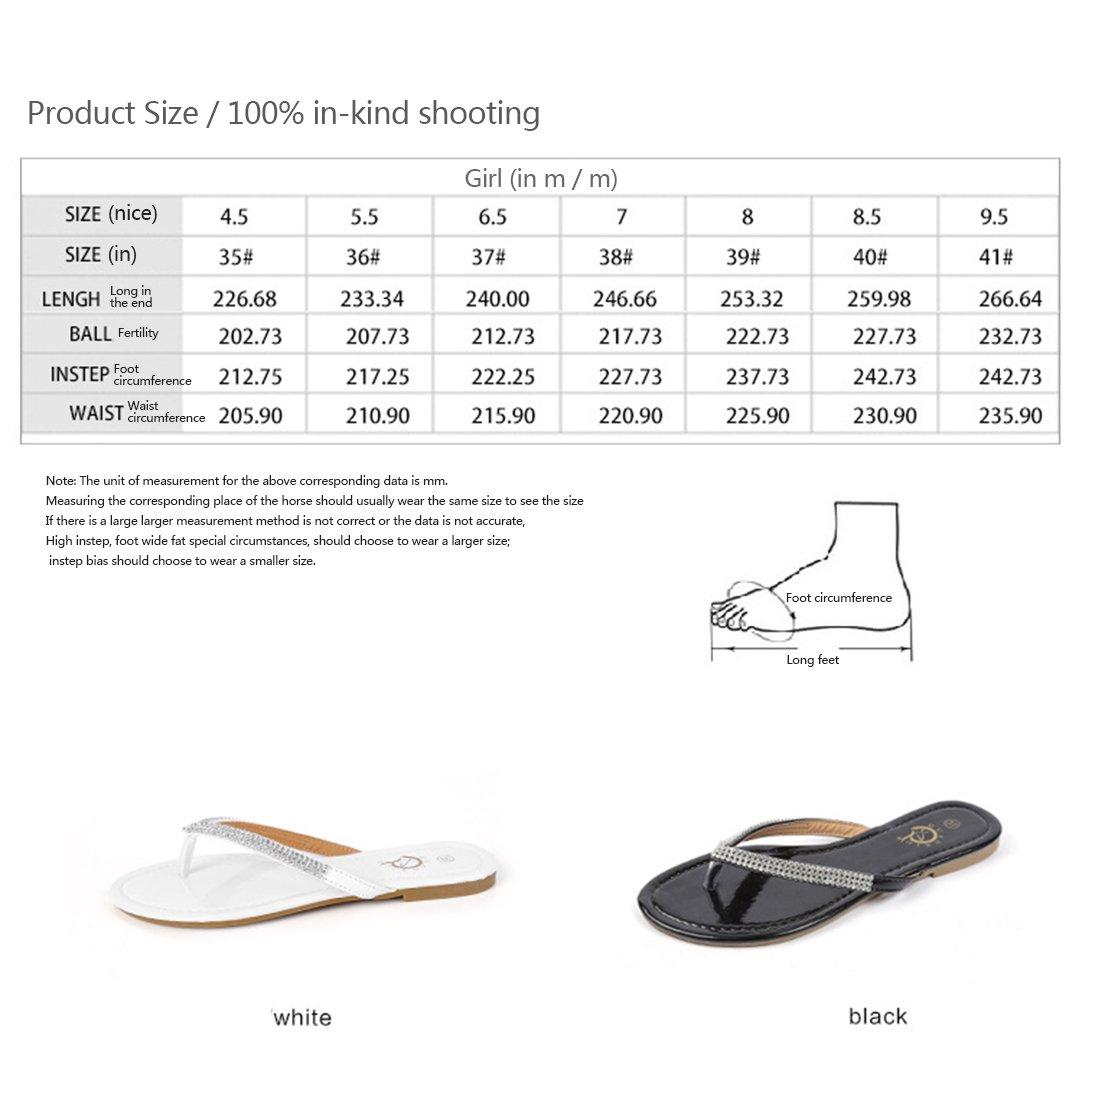 Niceful Women's Flat Rhinestone Flip Flops PU Large Size Casual Summer Sandals B07BKY33RS 10 B(M) US|White